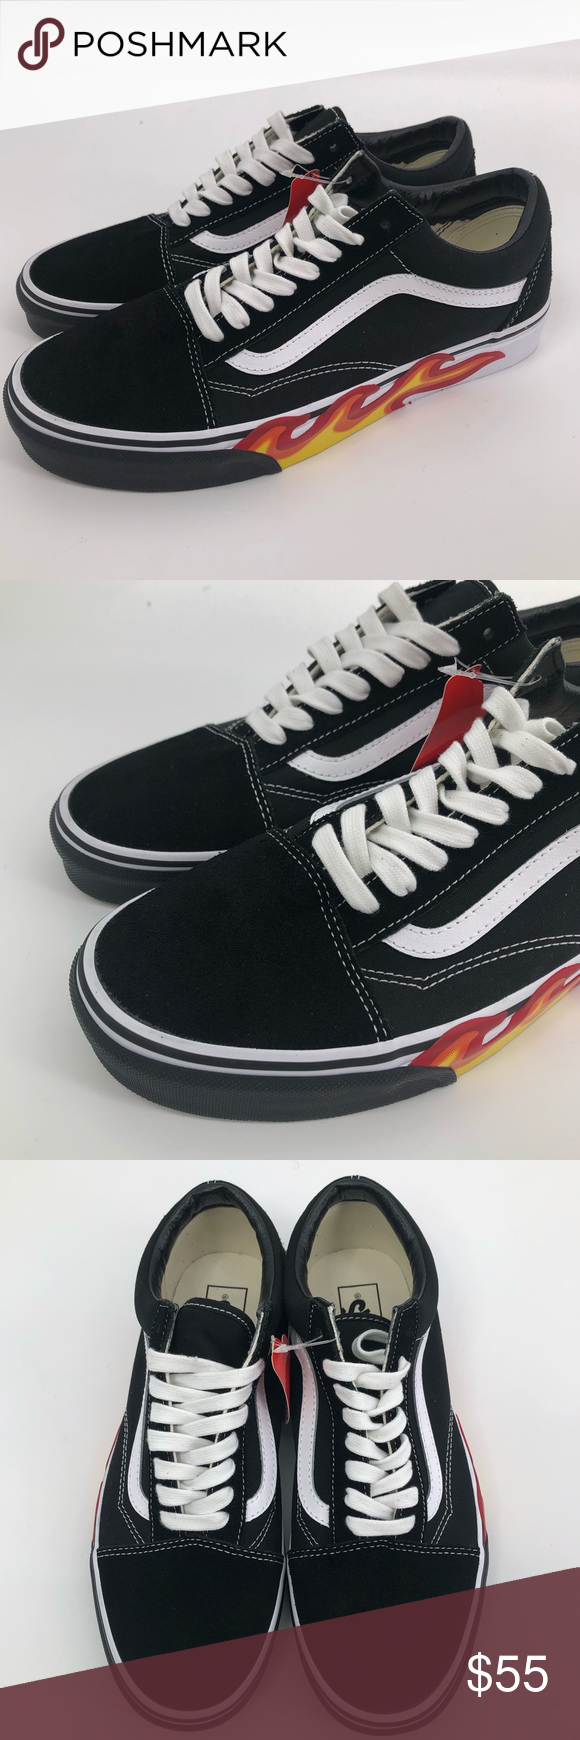 vans flame cut out old skool shoes